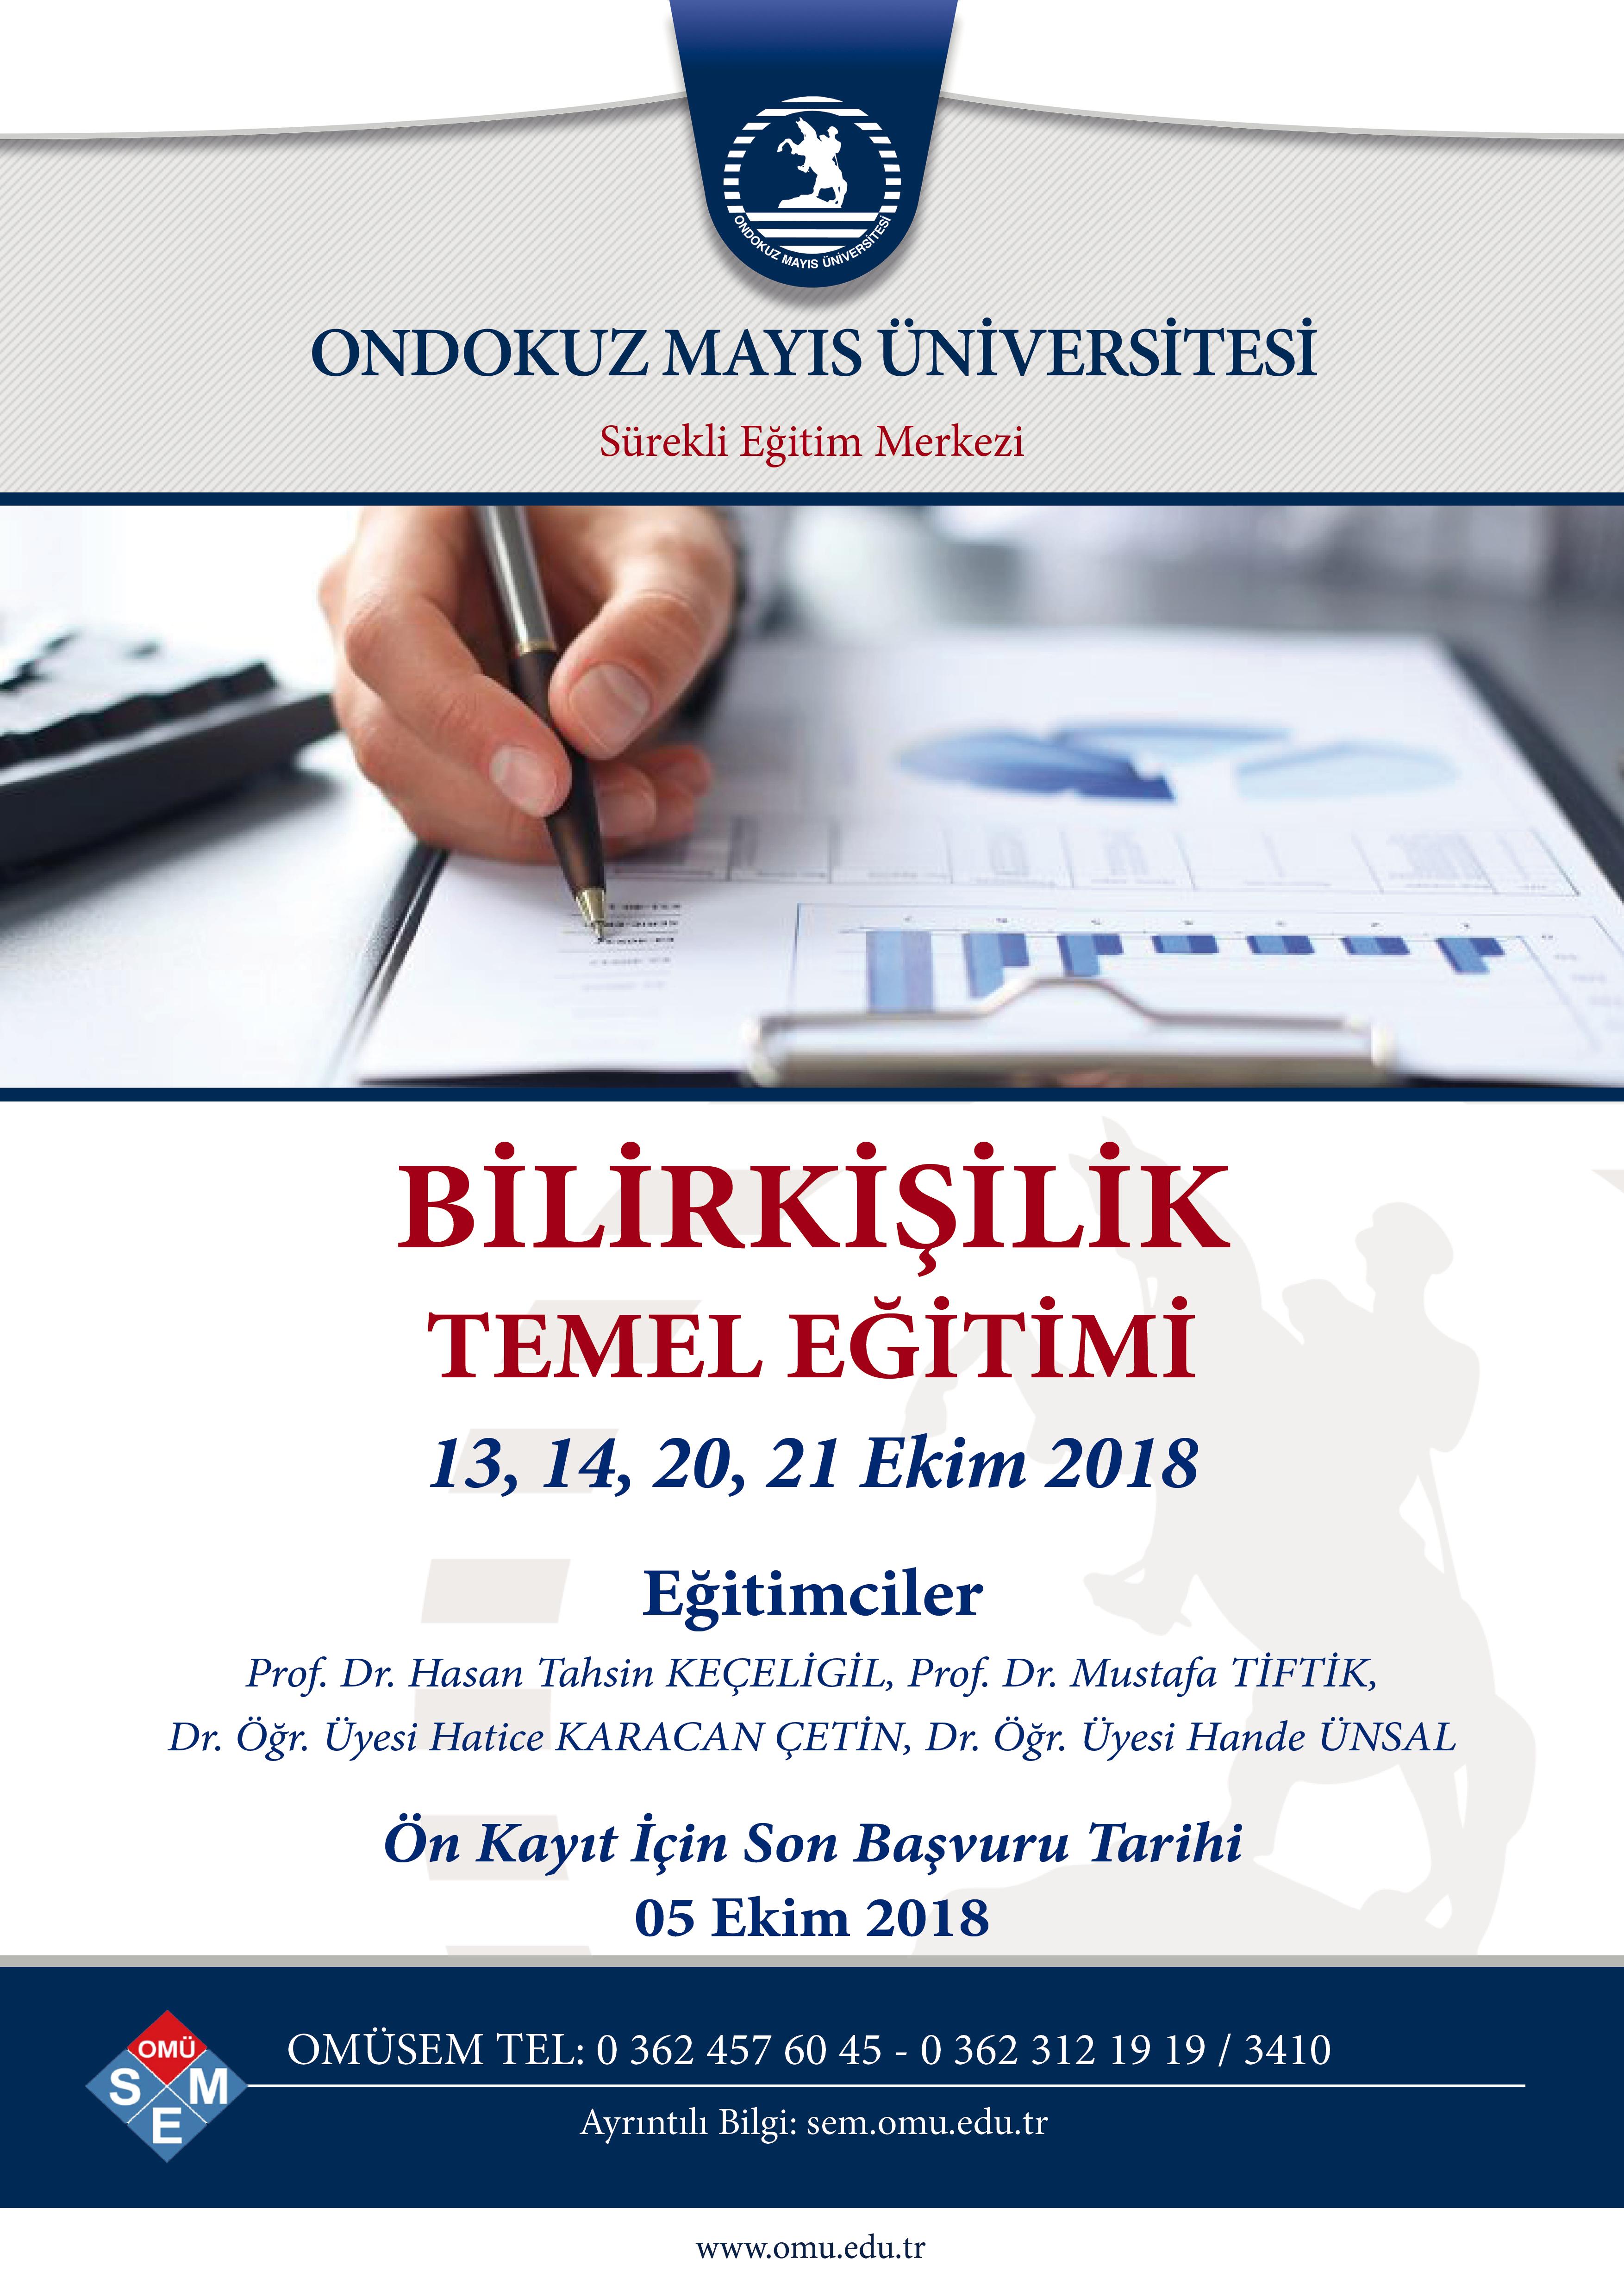 http://www.omu.edu.tr/sites/default/files/bilirkisilik_temel_egitimi_-afis.jpg